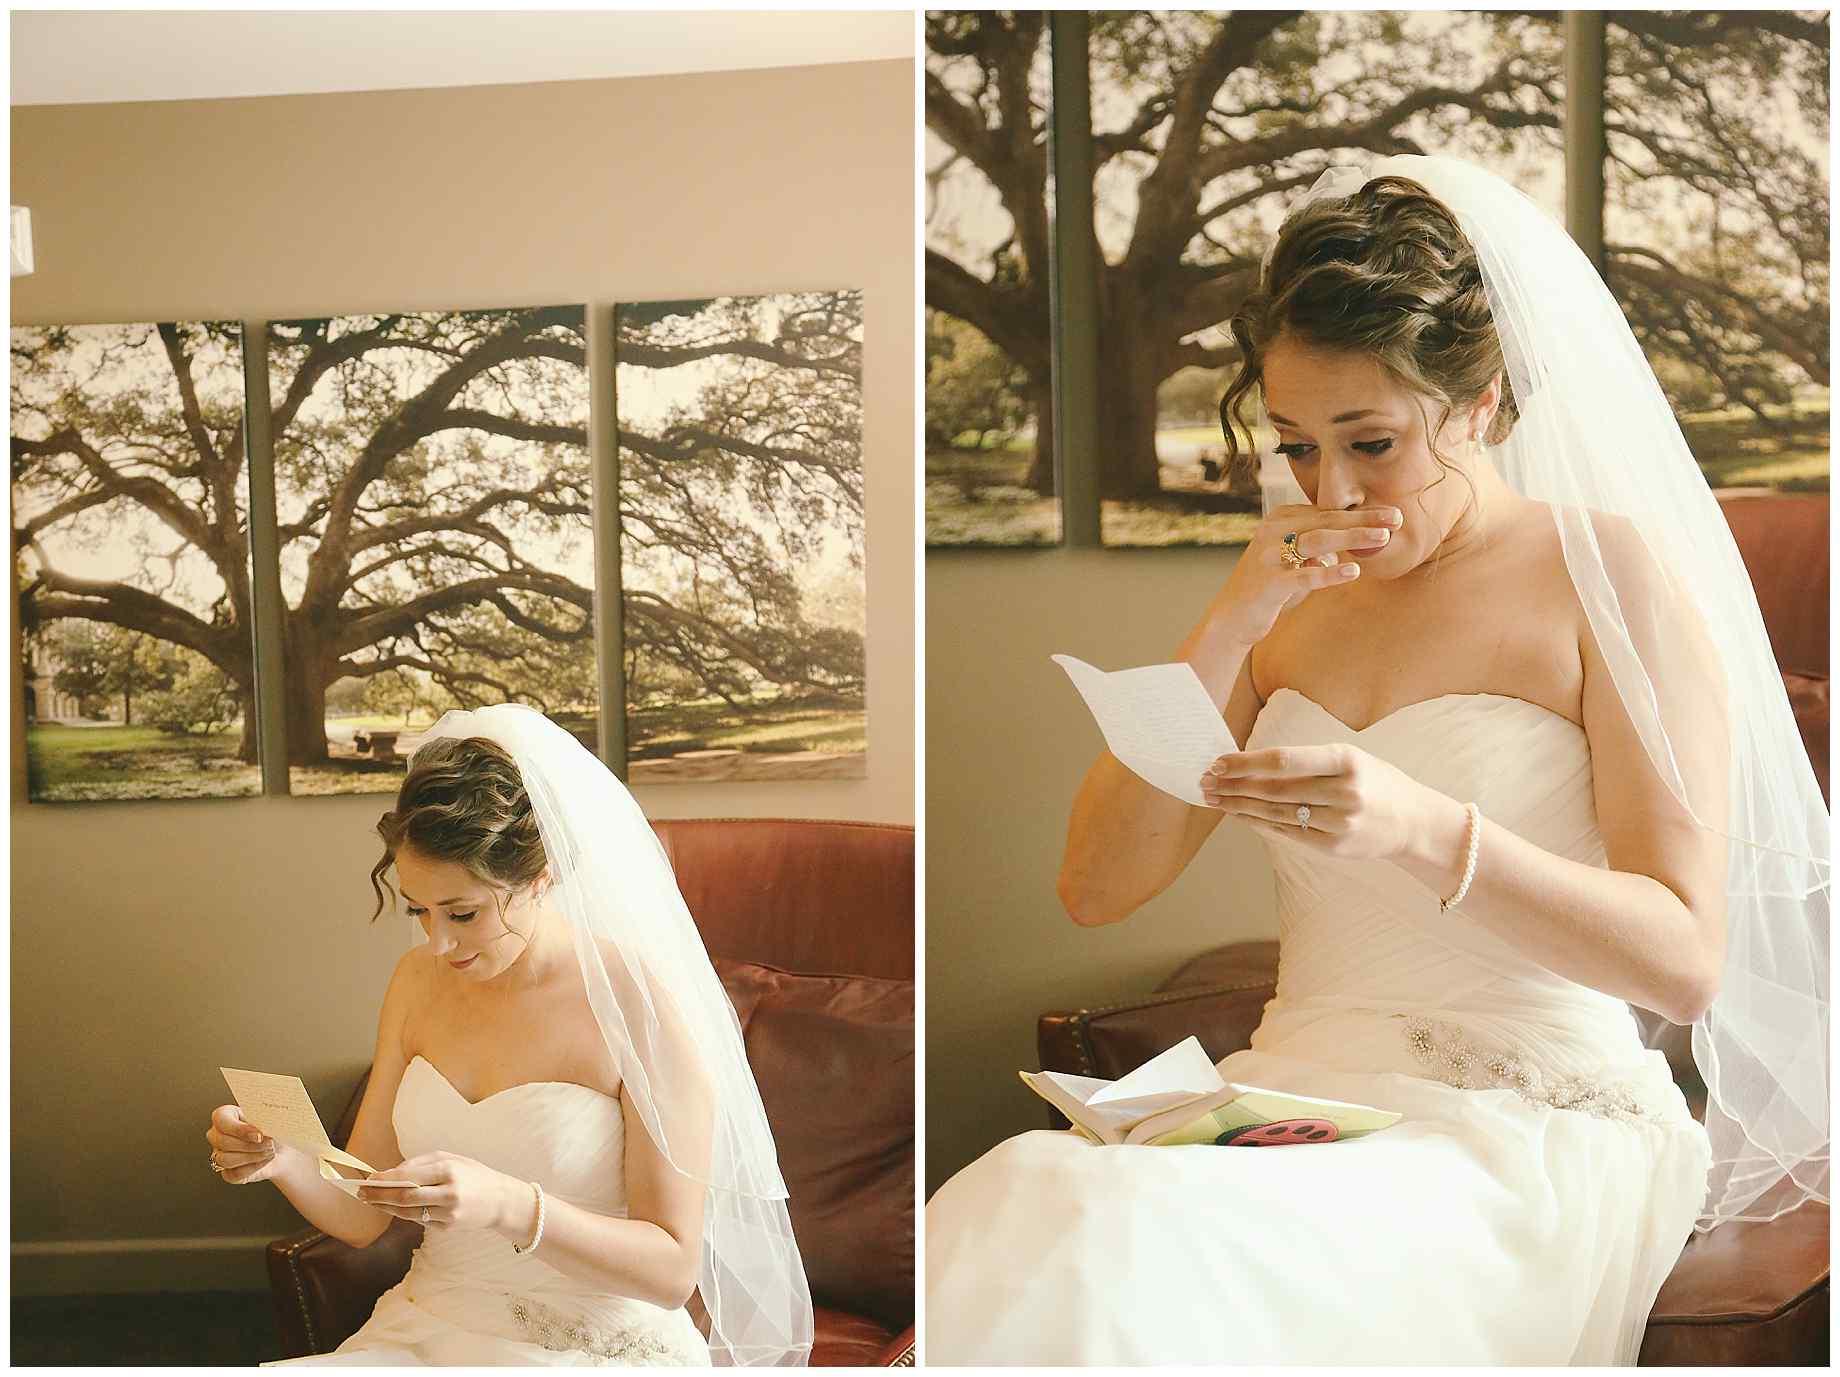 aggie-century-tree-wedding-07